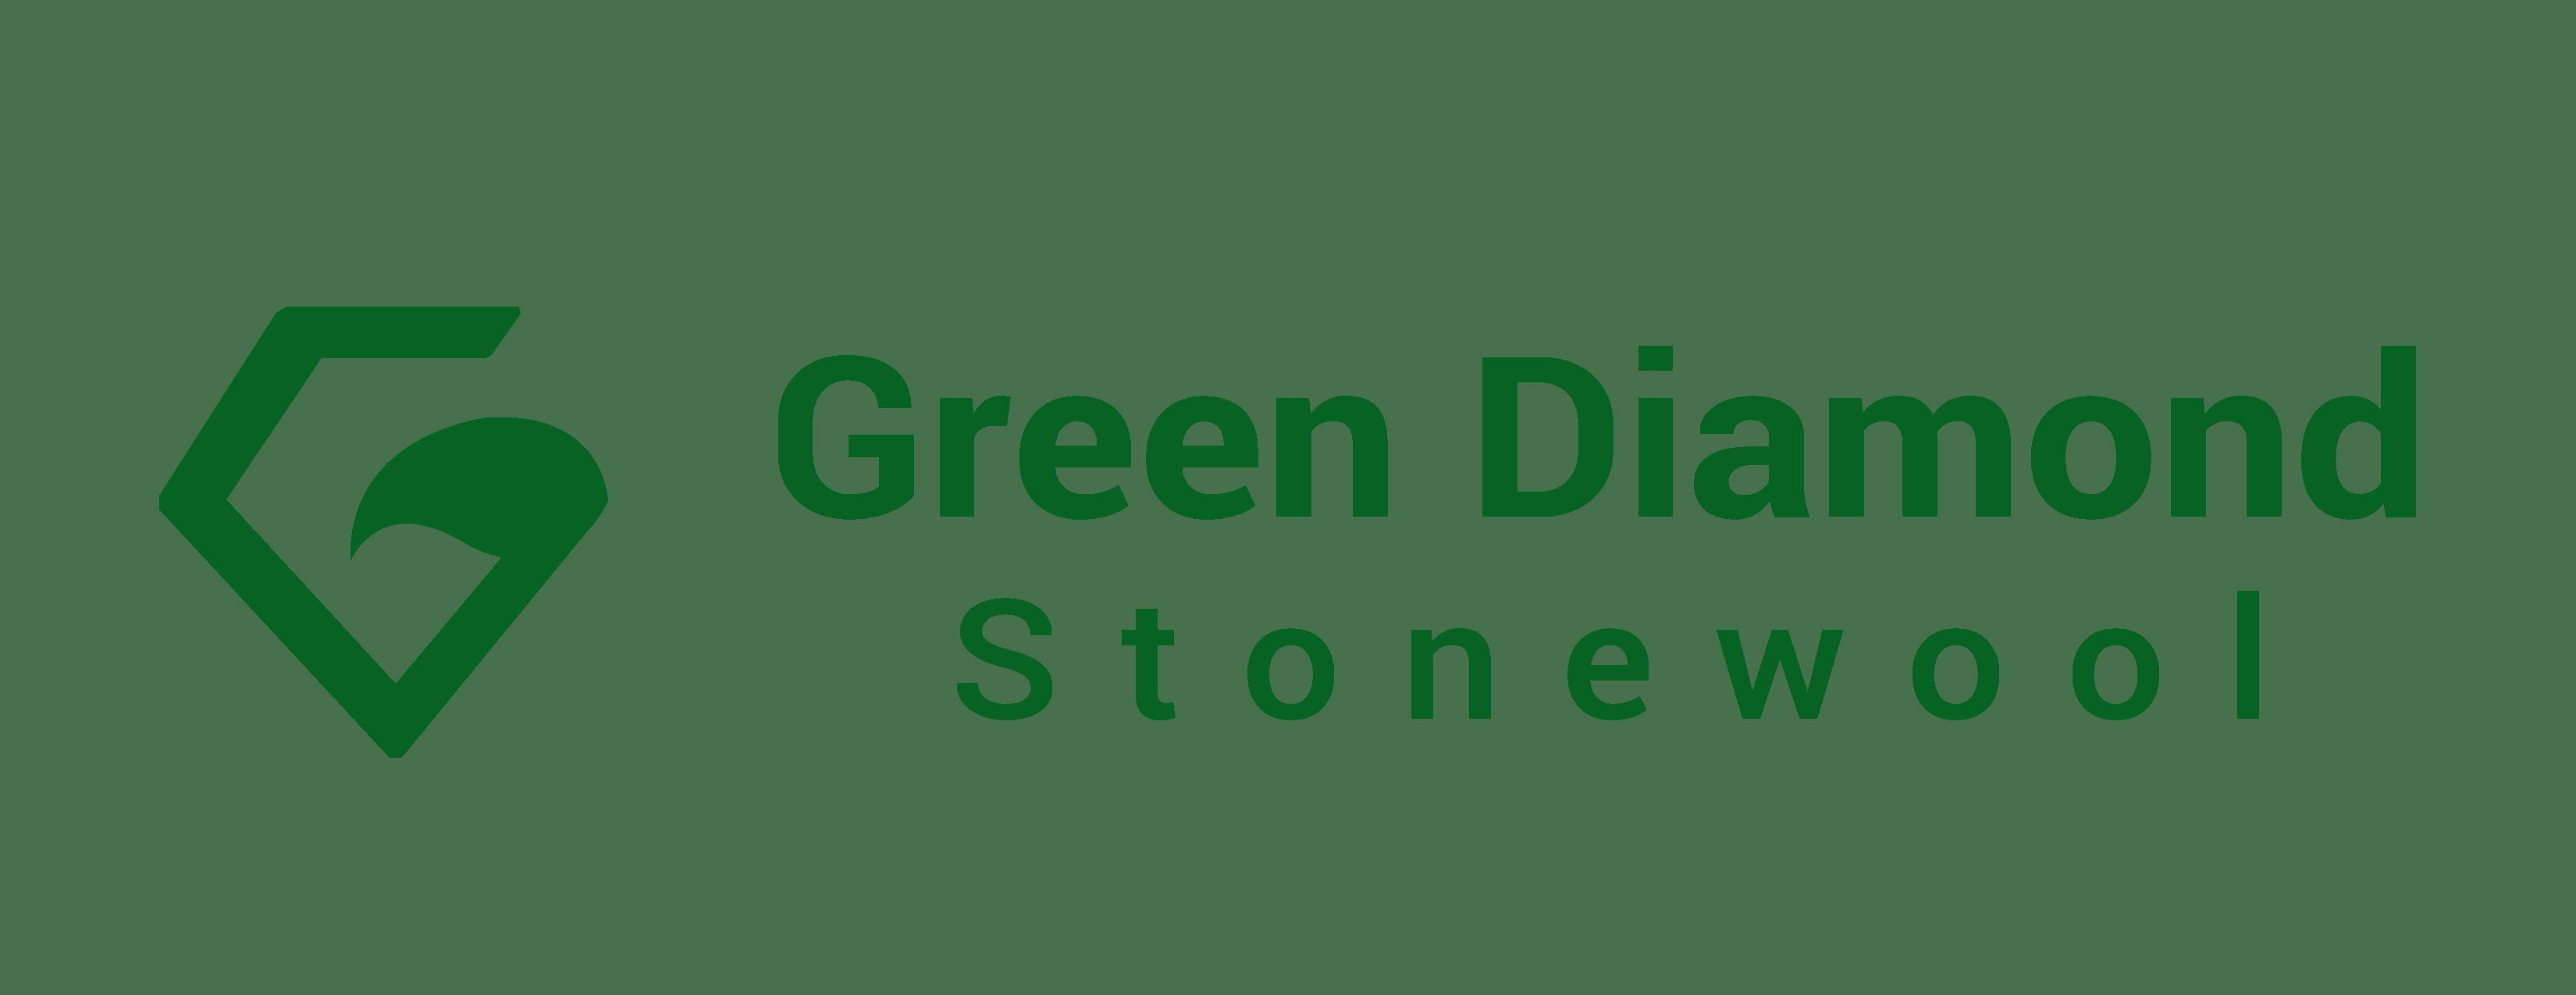 Green Diamond Stonewool